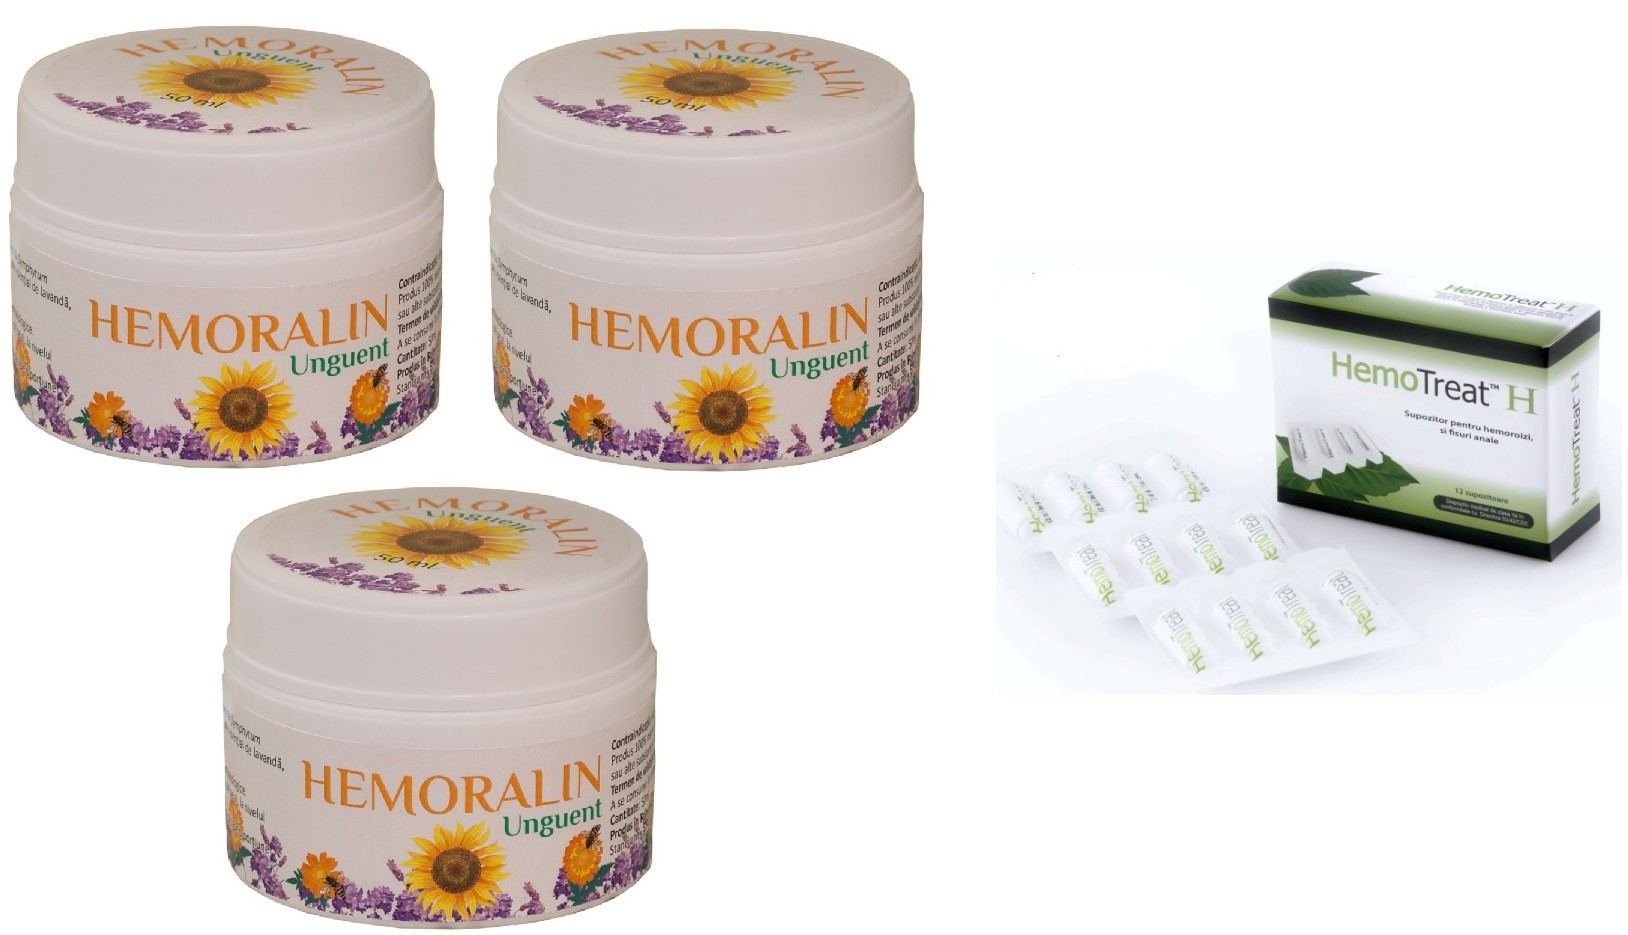 Oferta Hemoralin 3 Bucati + HemoTreat H 12 supozitoare